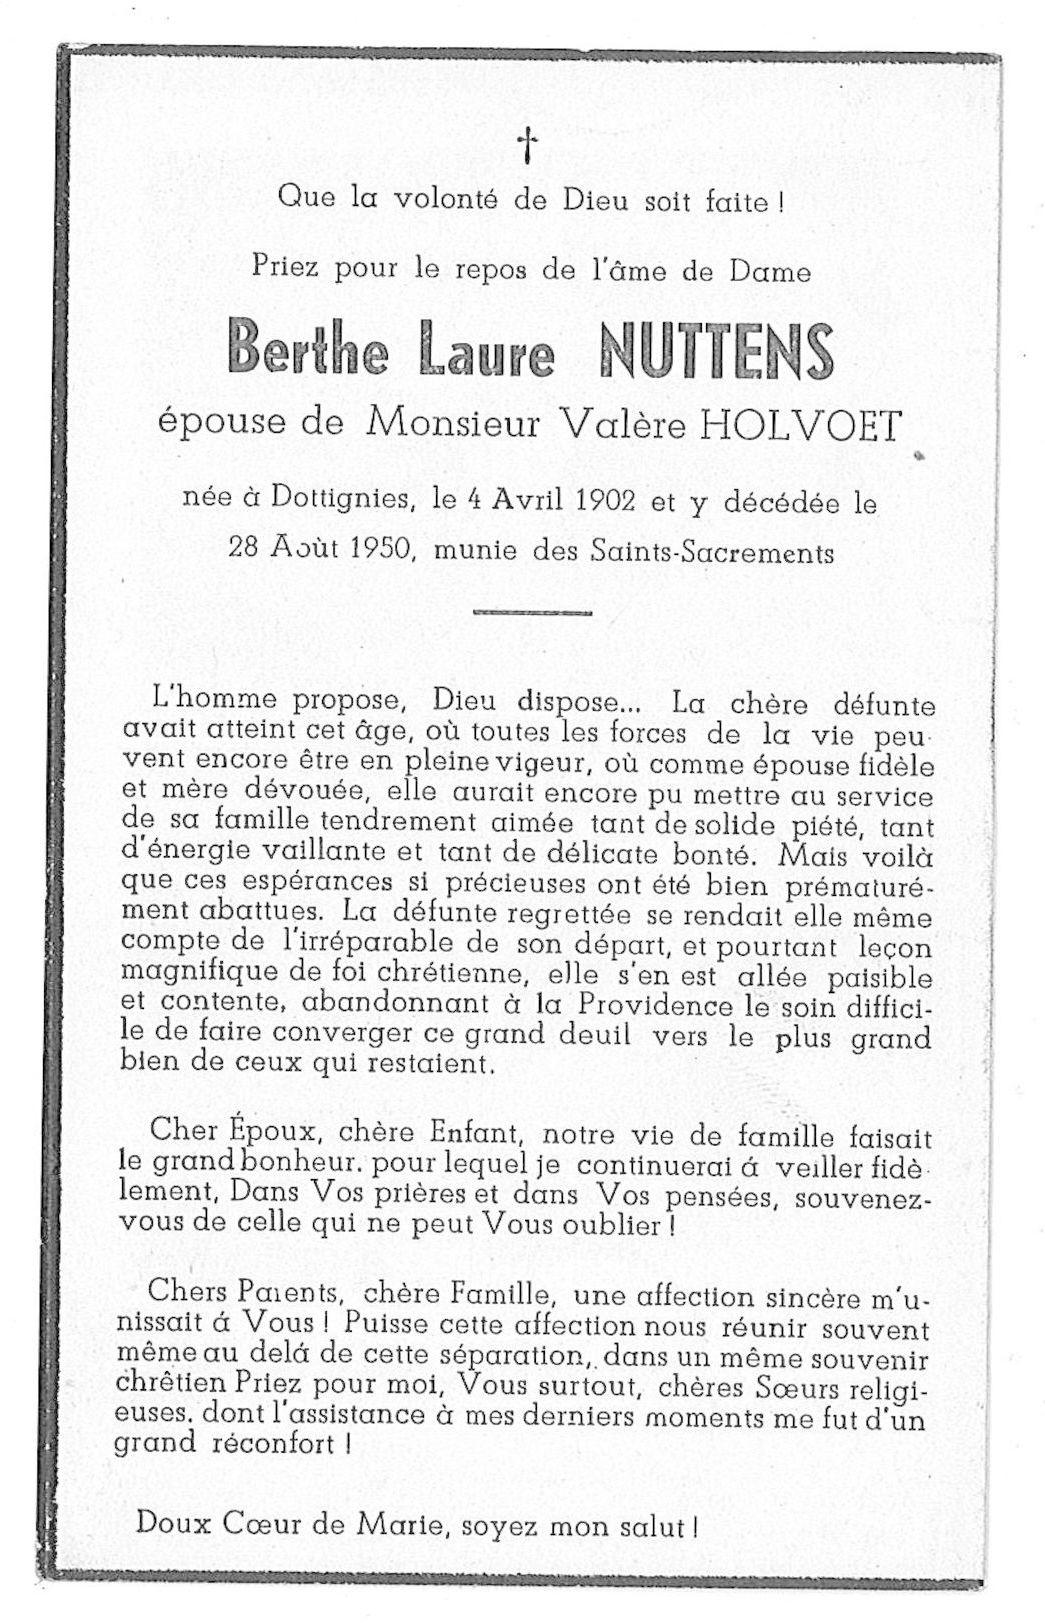 Berthe-Laure Nuttens